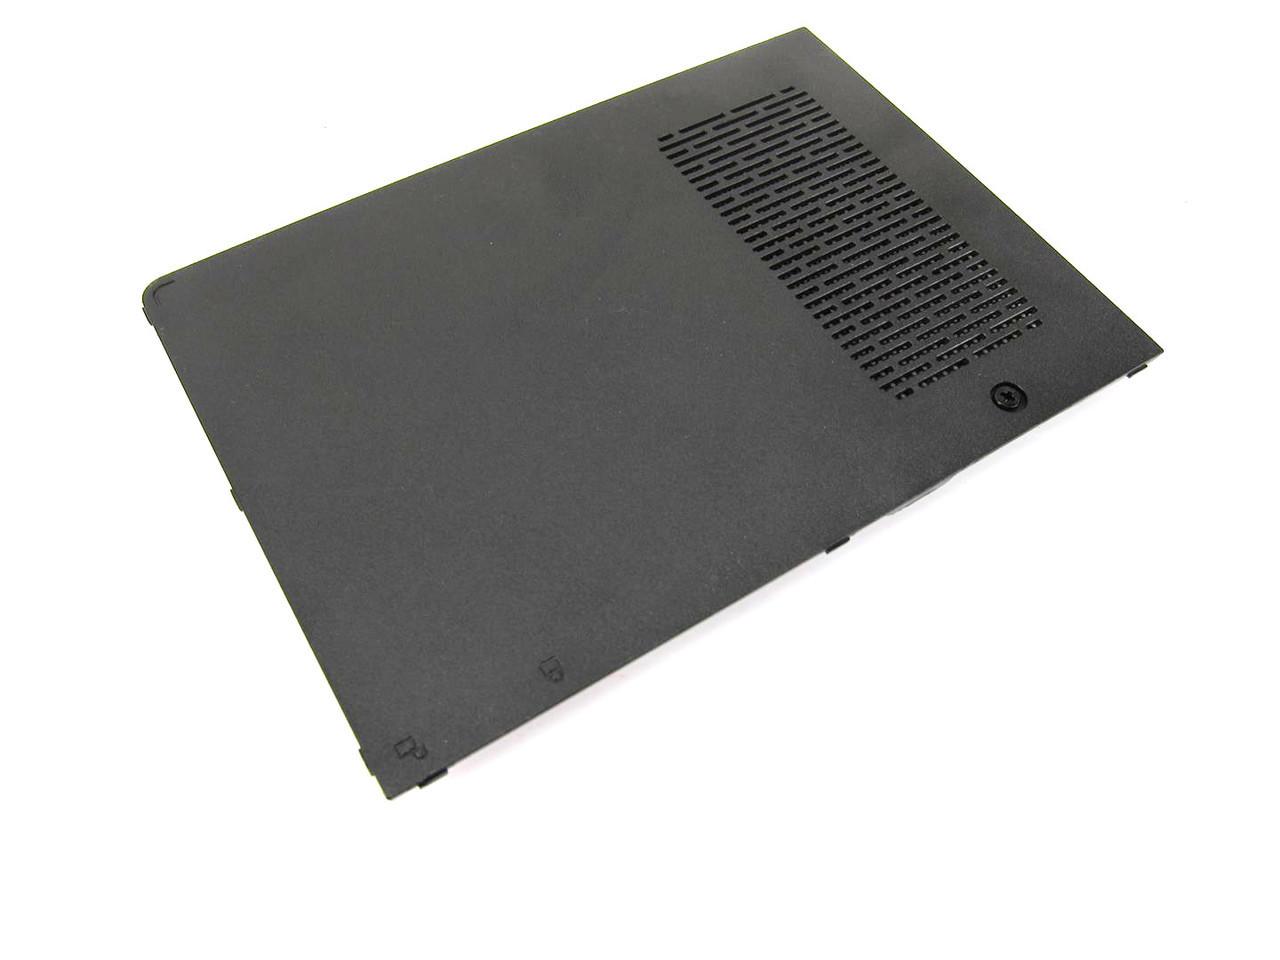 Dell inspiron N4110 Bottom Access Panel Door - 29PY4